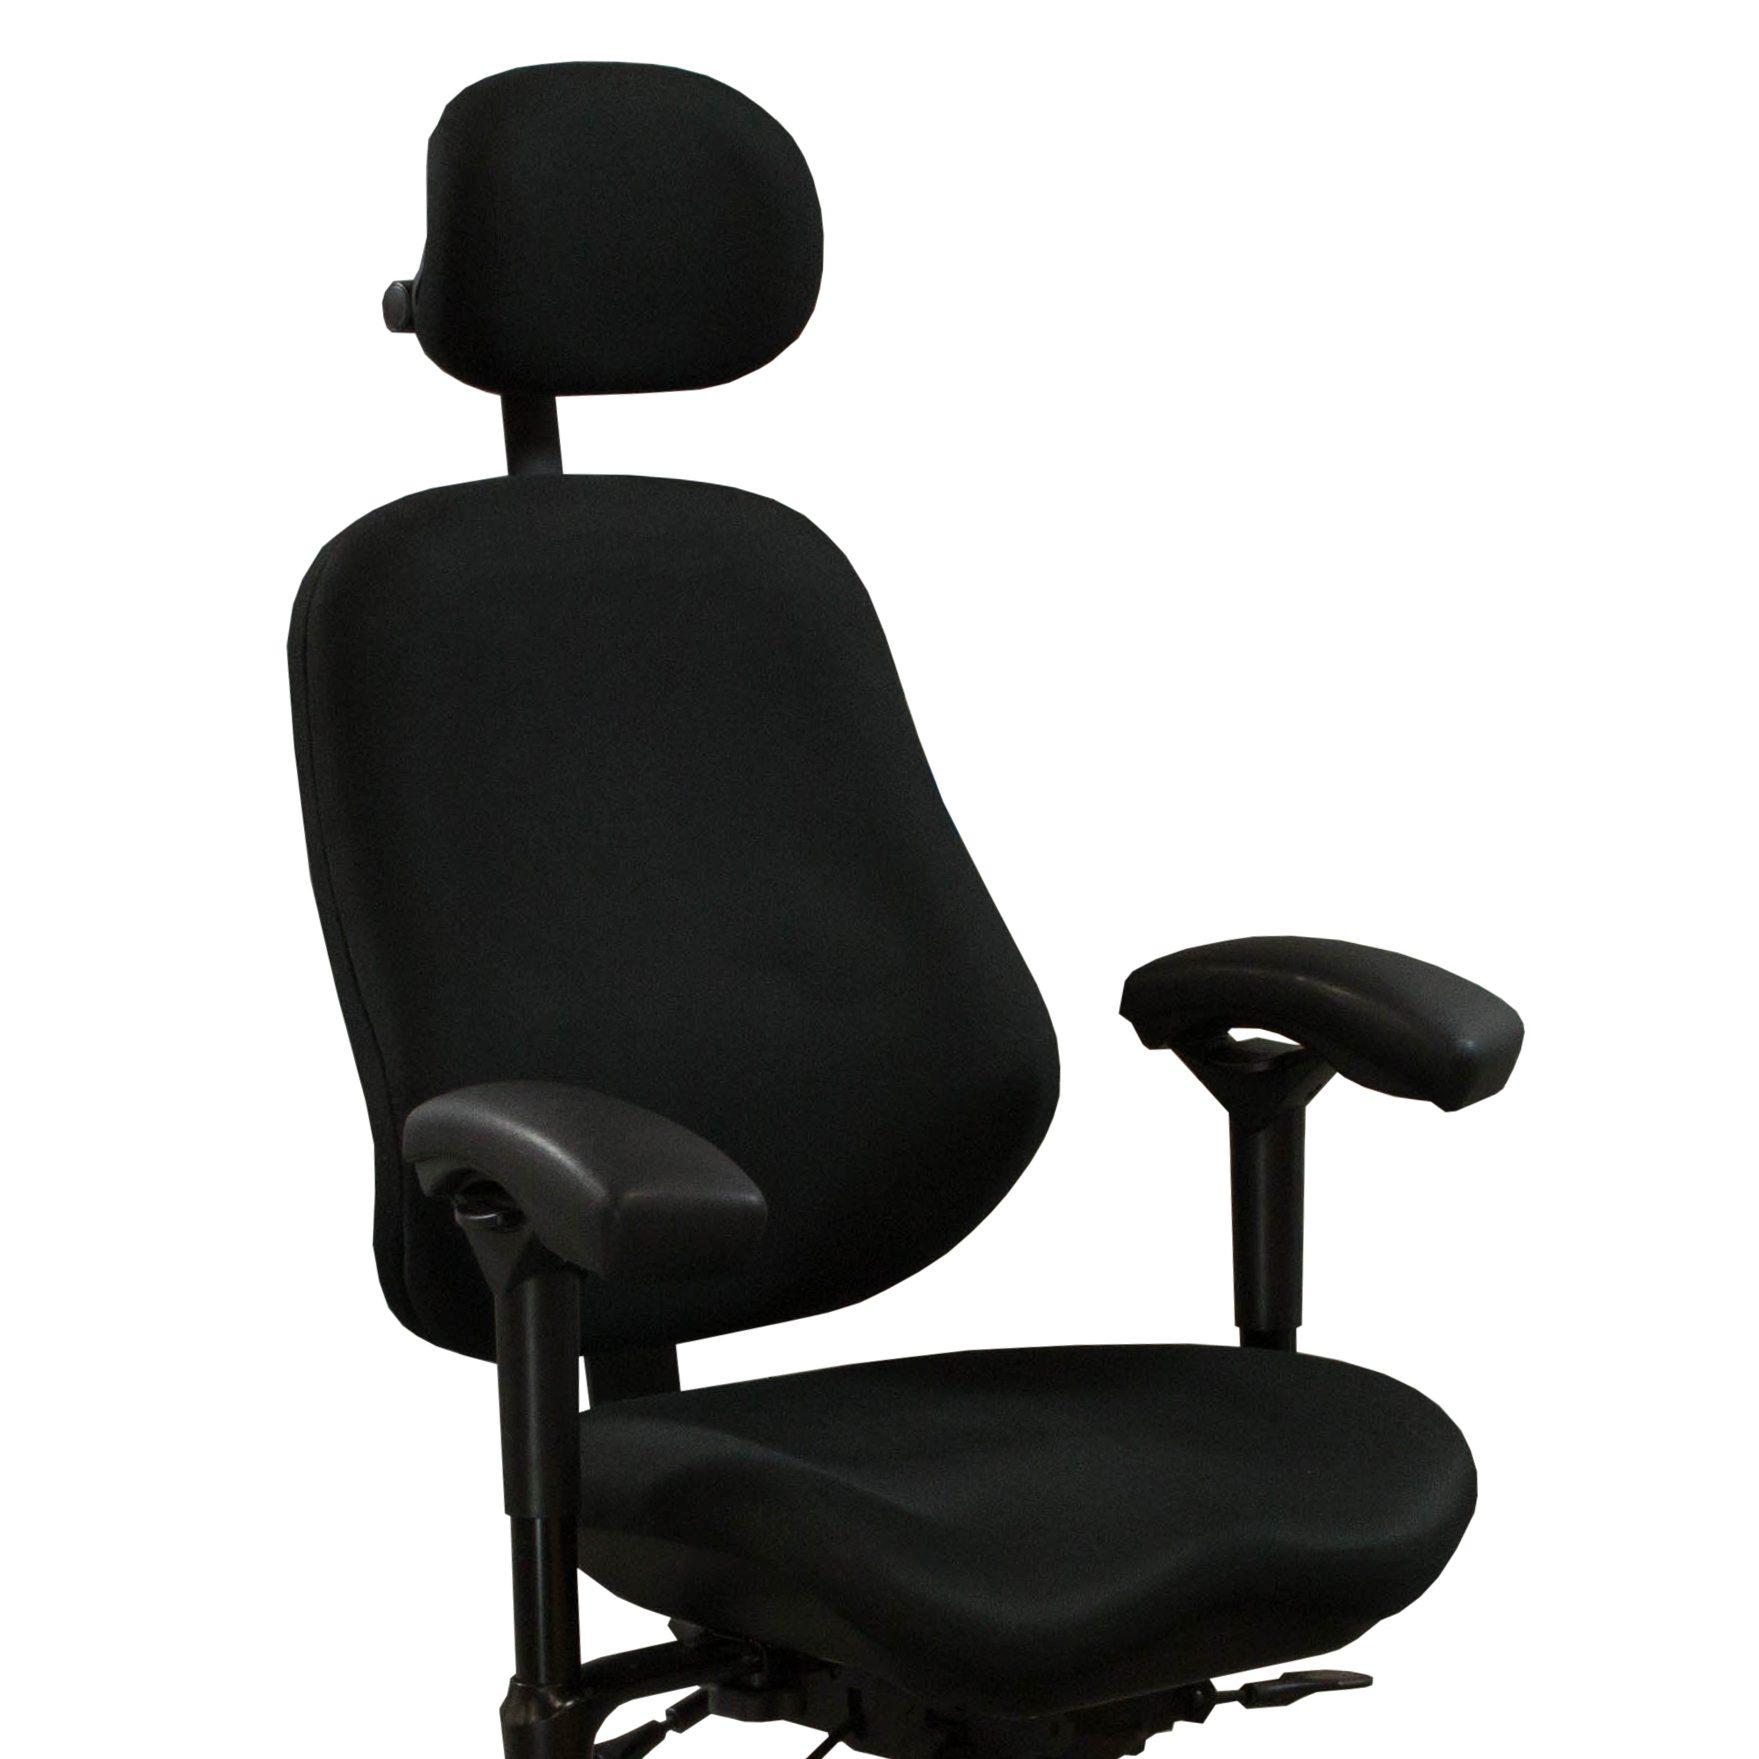 body built chairs cushions for dining nz bodybilt j3507 used ergonomic stool w headrest black